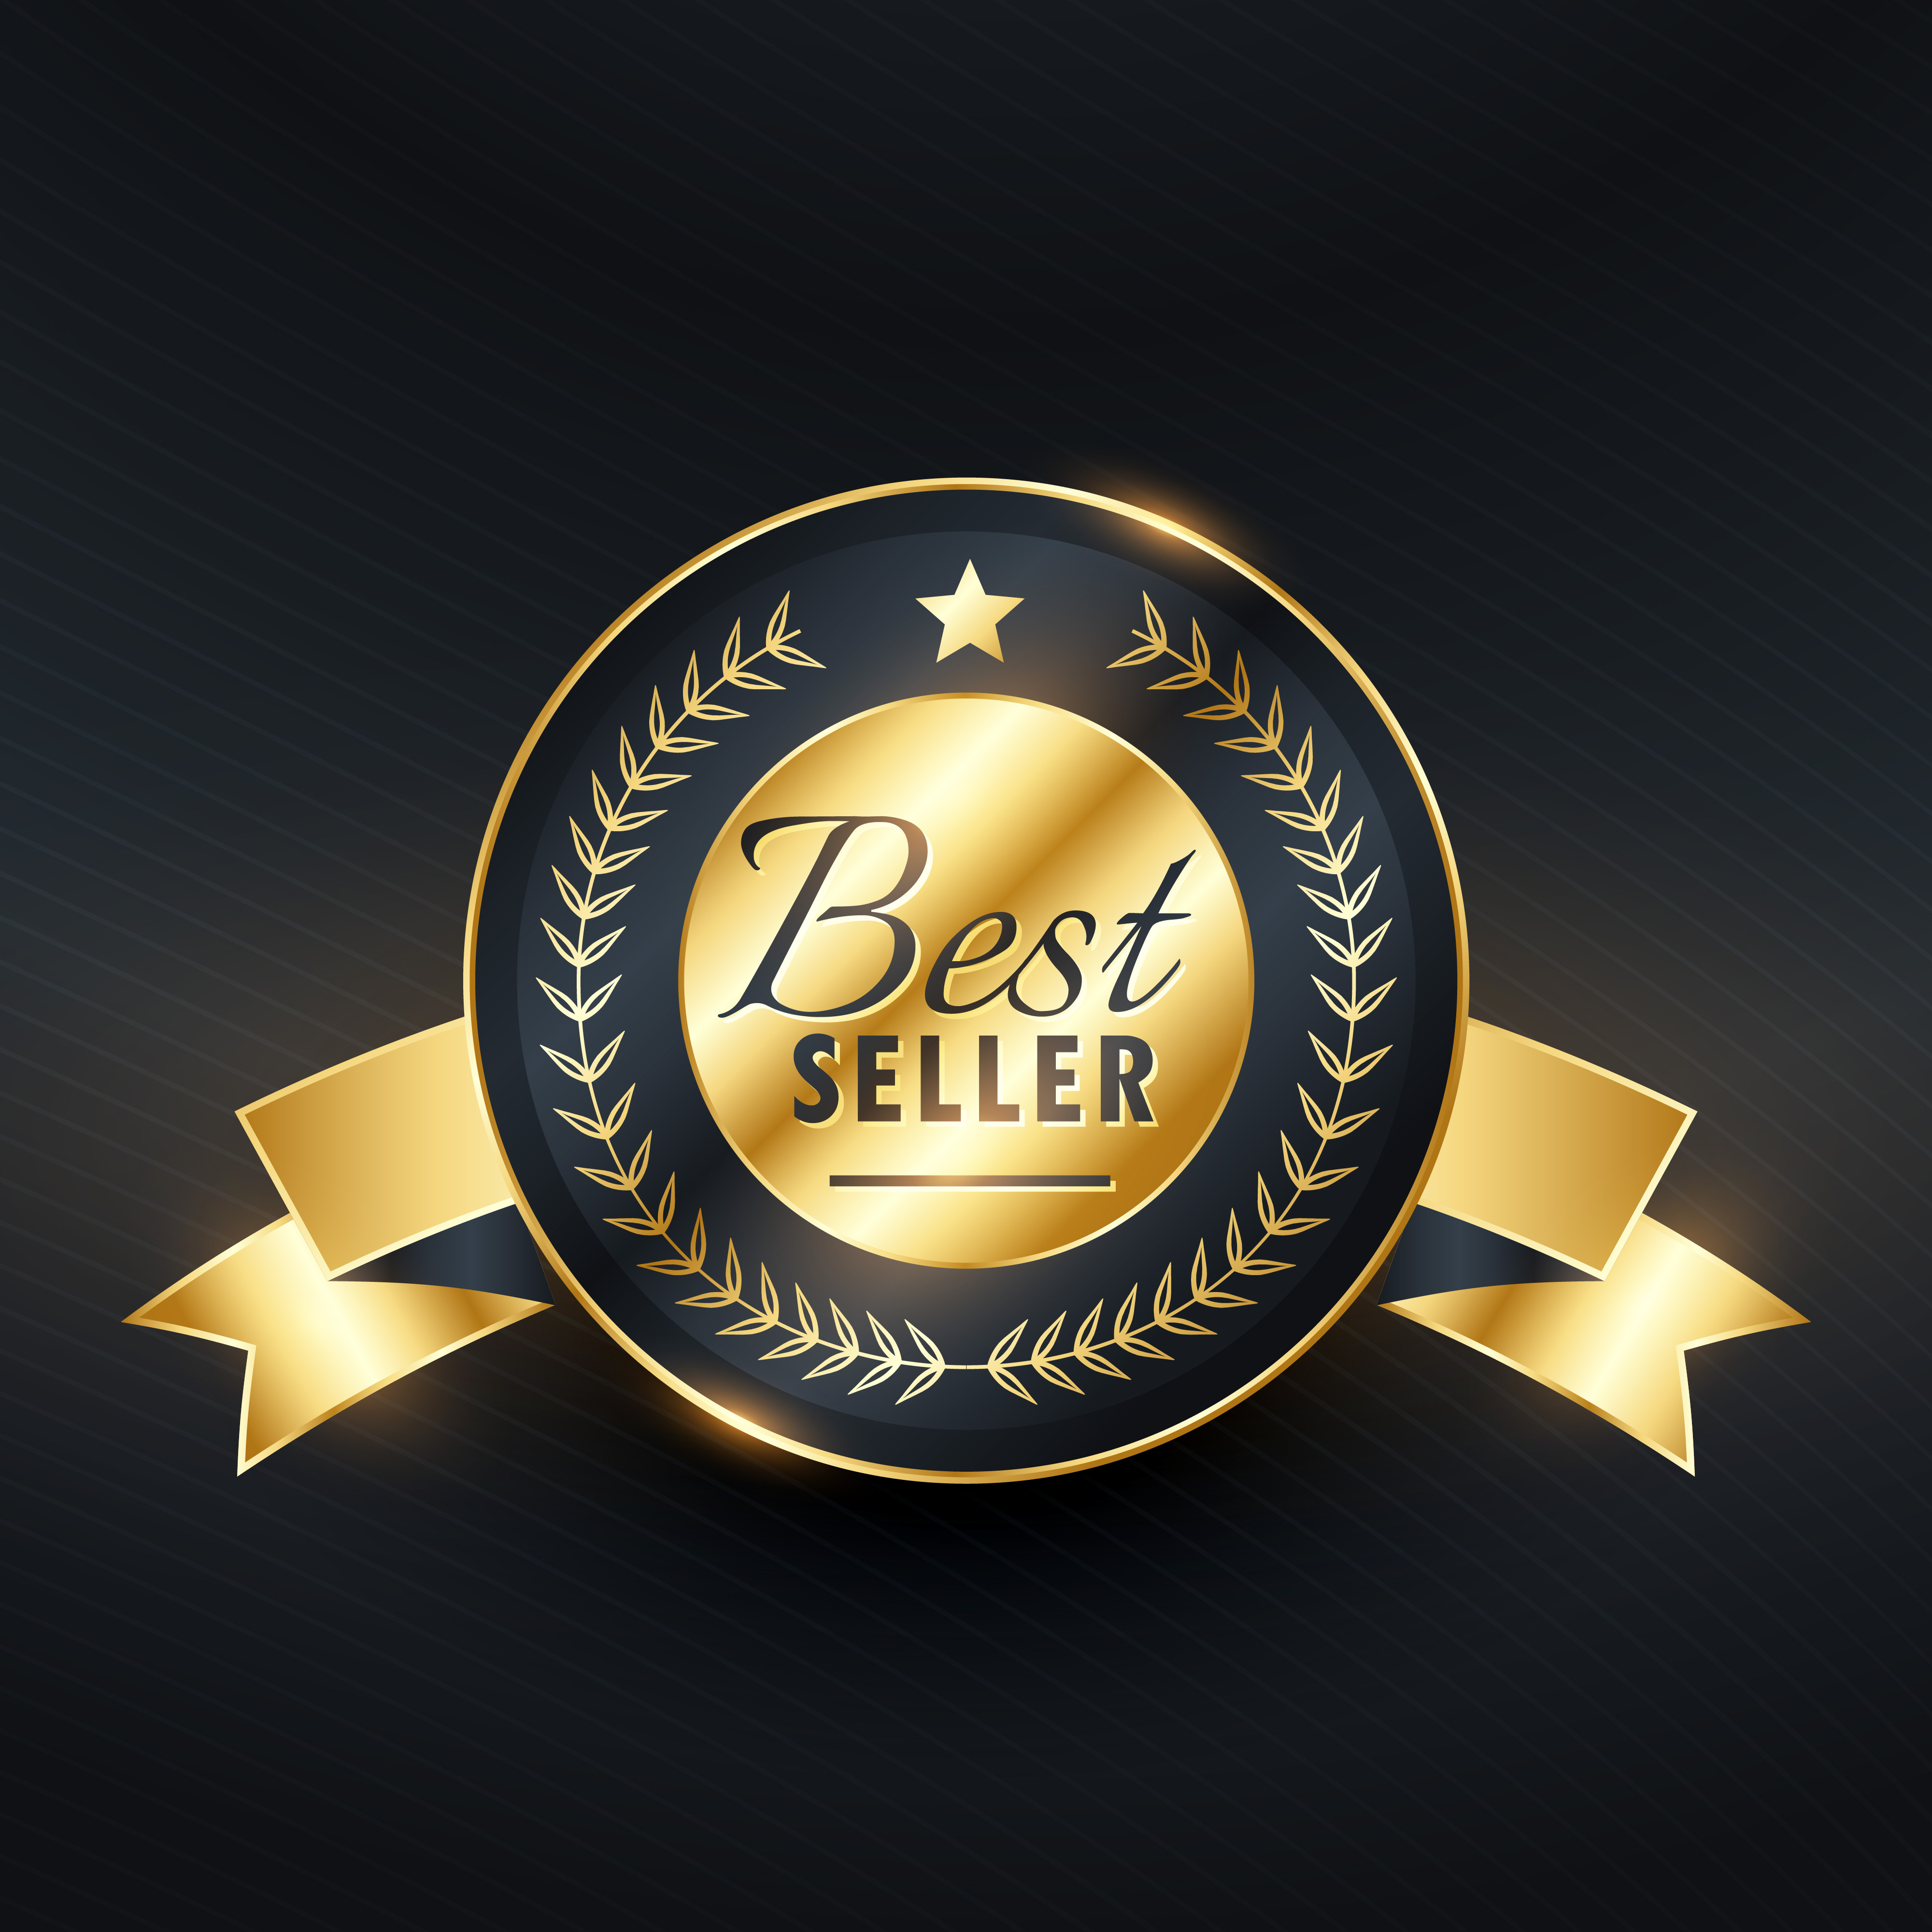 Best Seller Golden Label Badge Vector Design